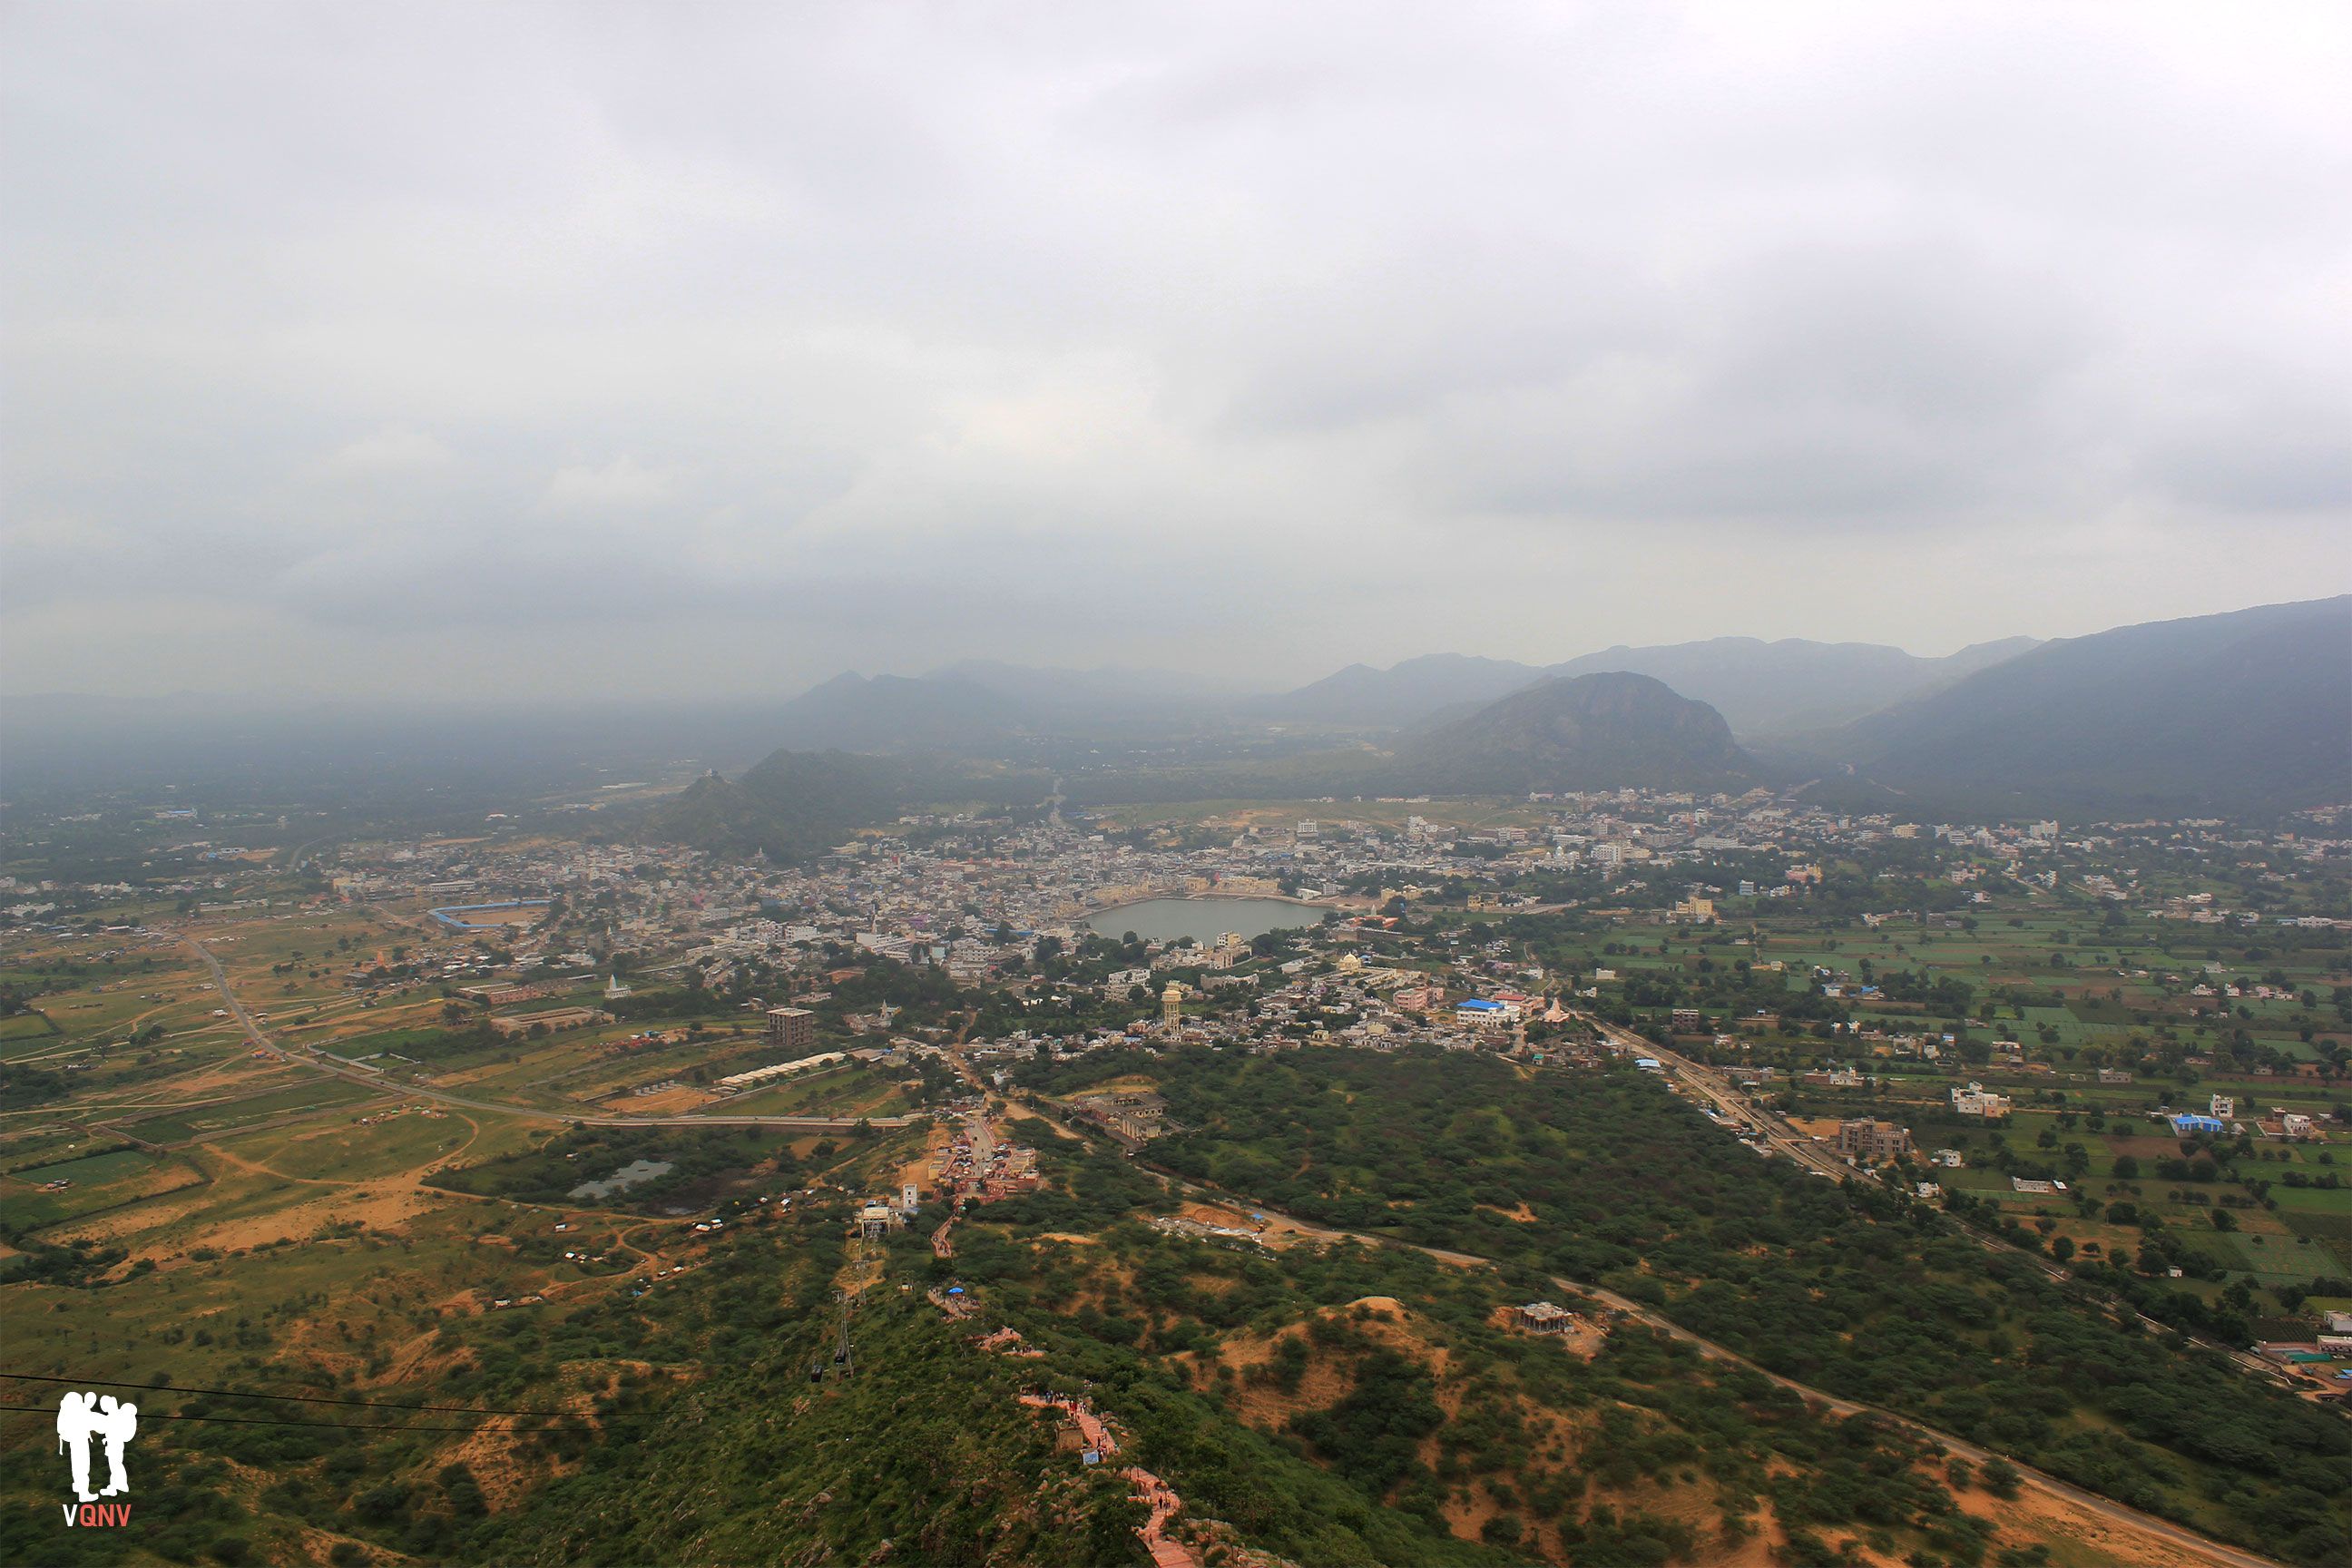 Pushkar desde el Templo Savitri